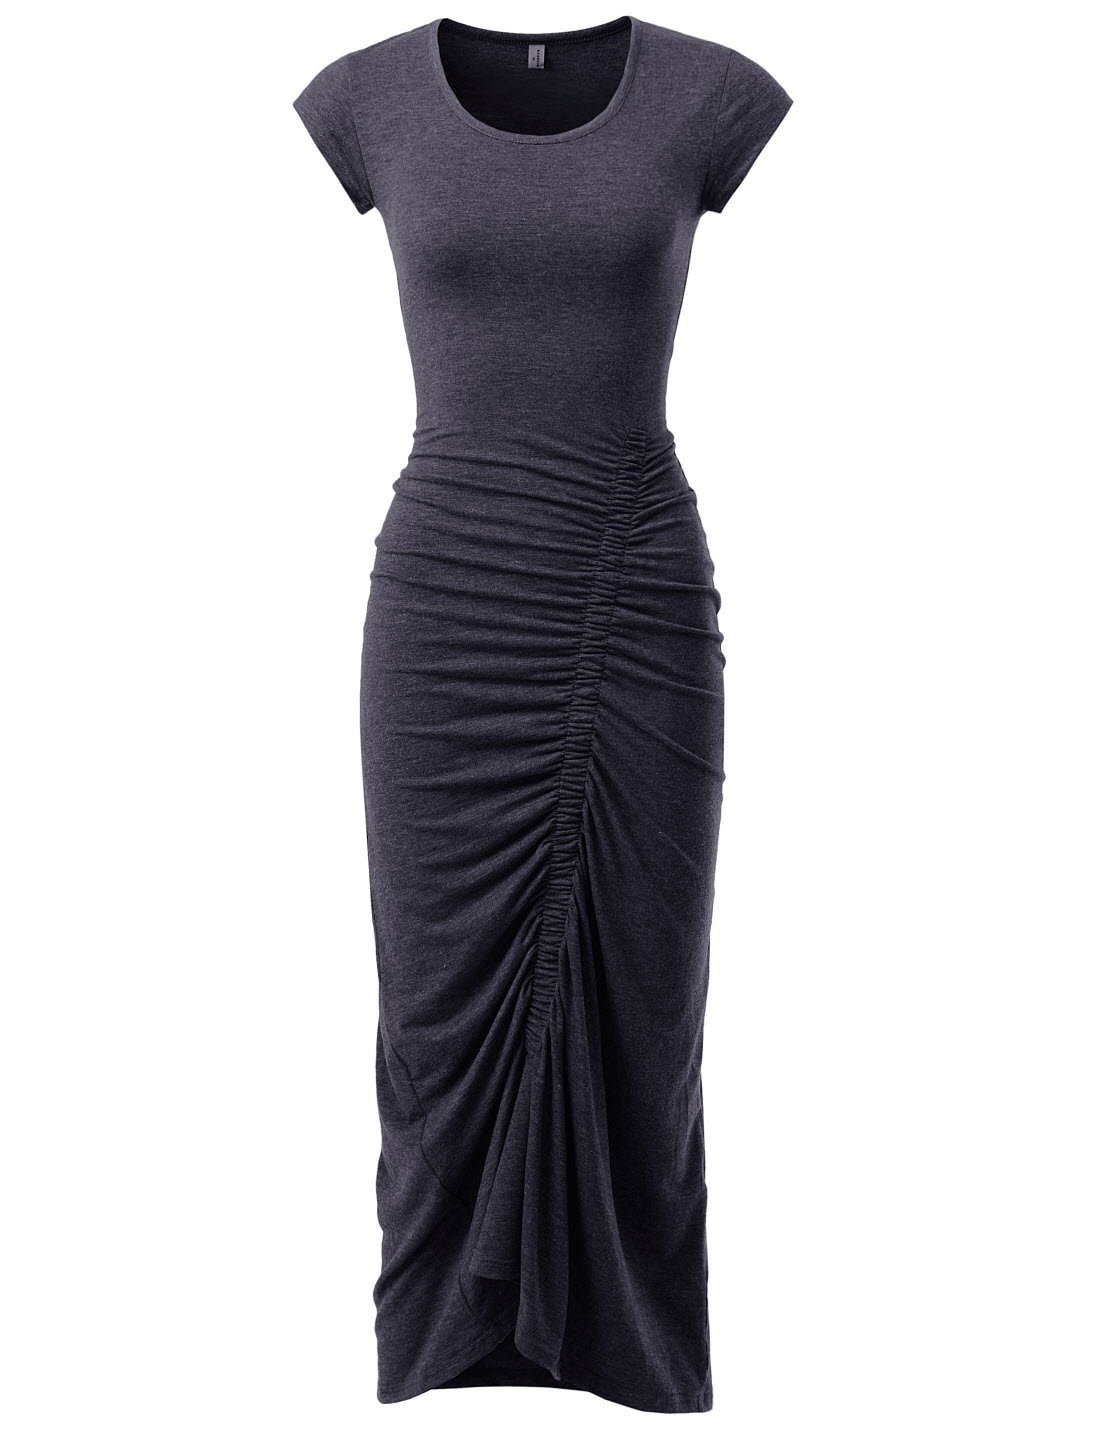 NEARKIN NKNKWBD801 Womens Cap Sleeve Figure Hugging Scoop Neck Shirred Maxi Dress Charcoal US M(Tag size L)